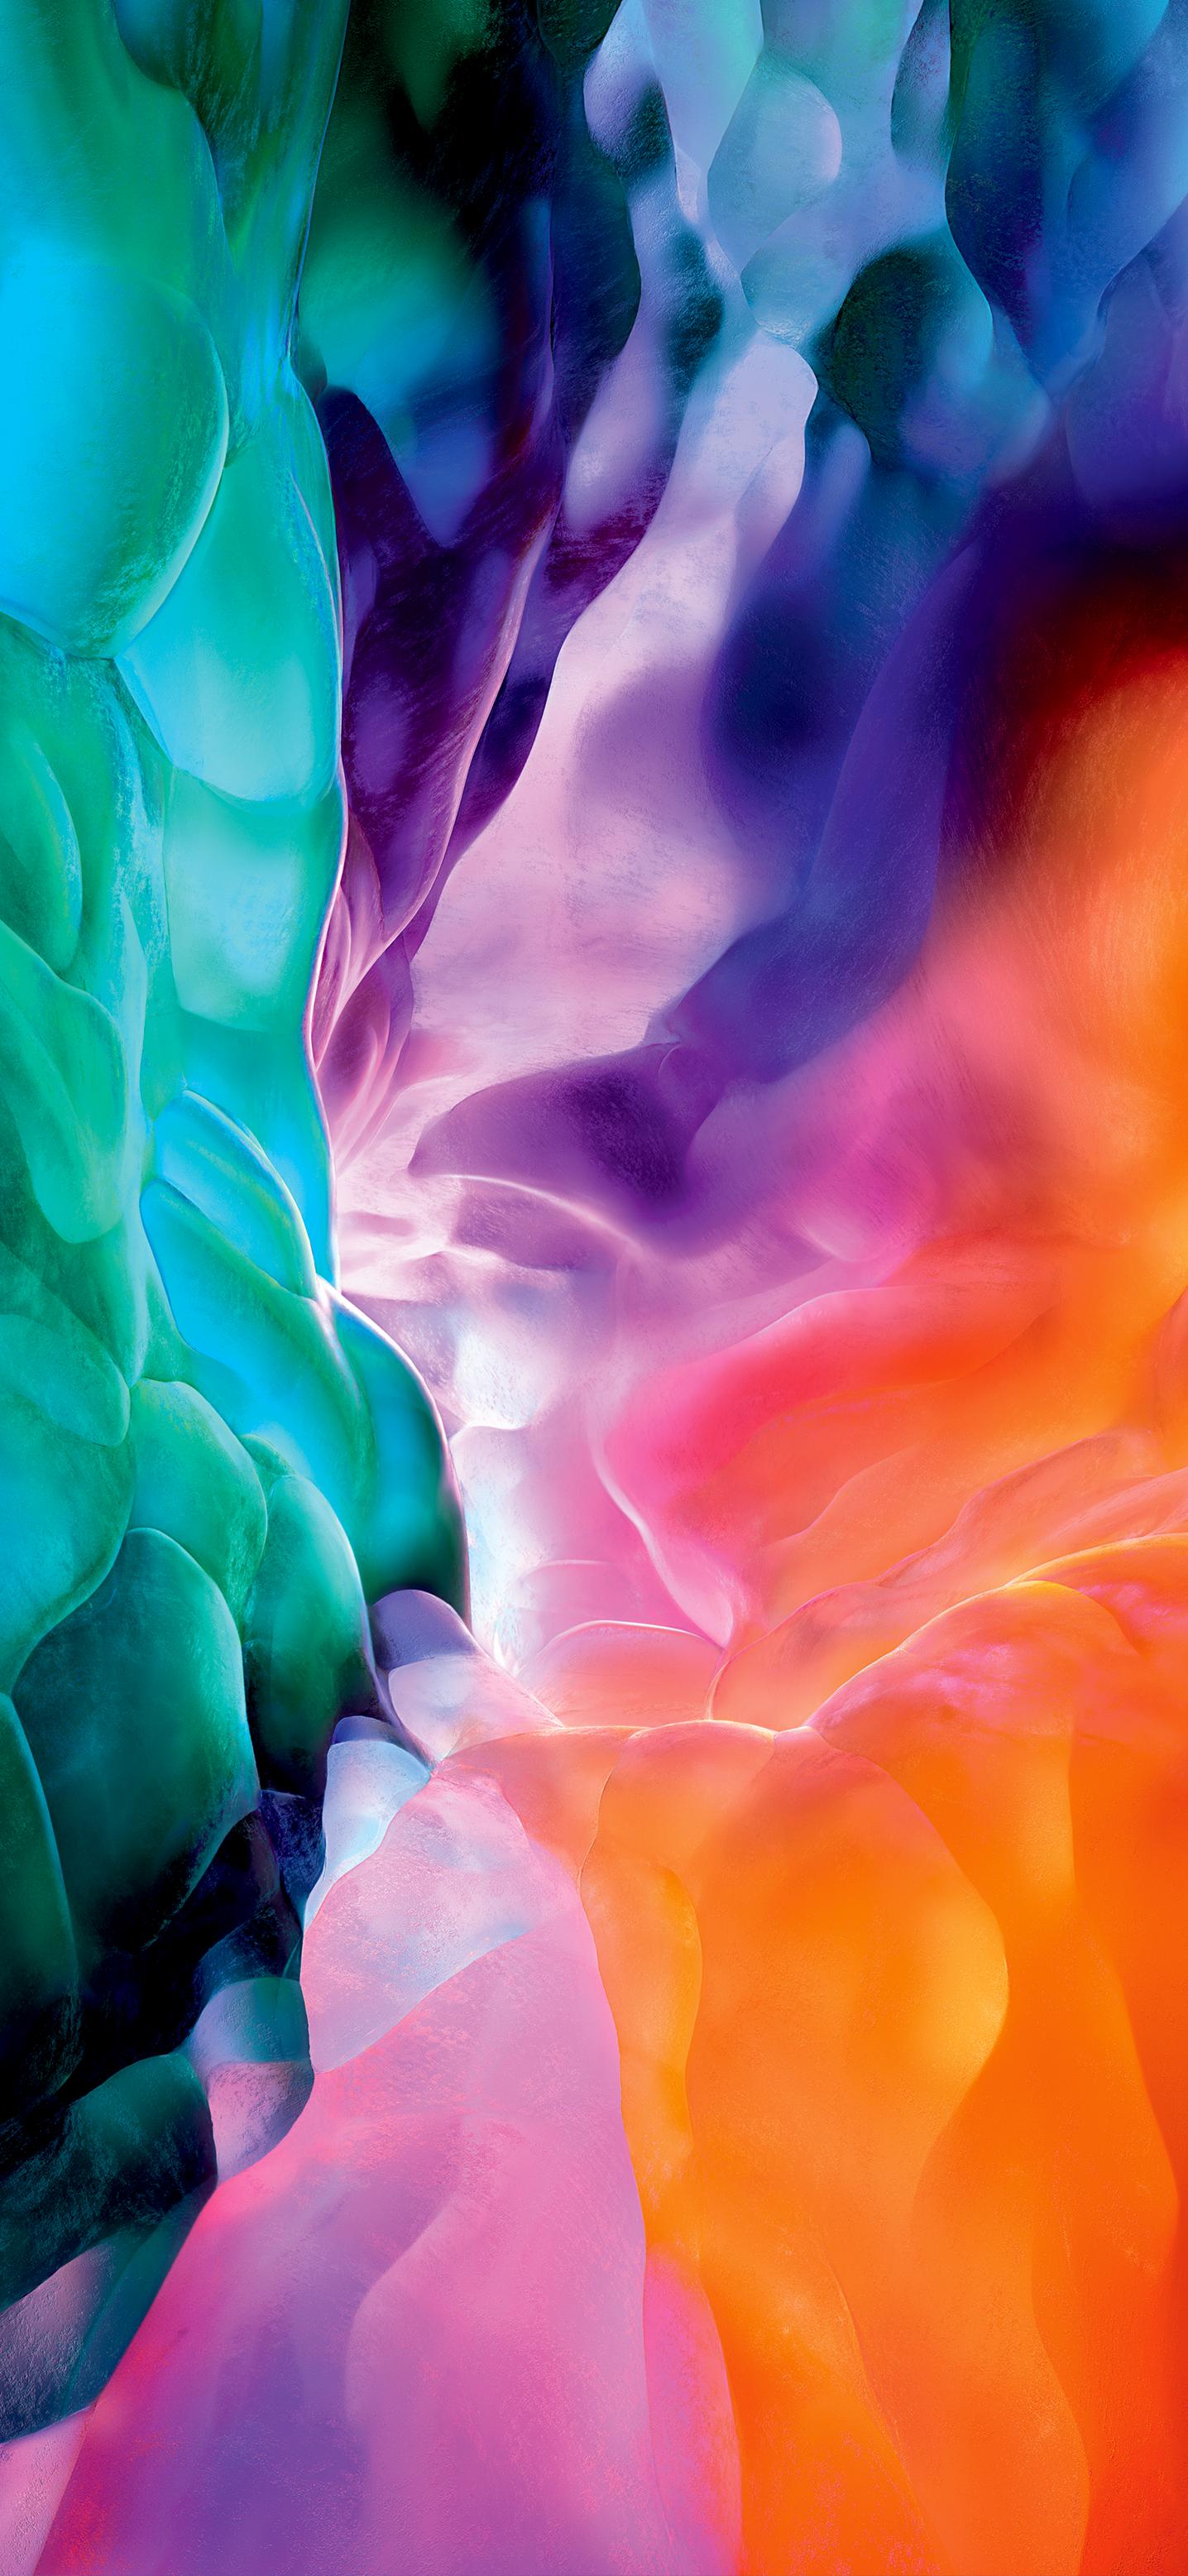 iPad Pro Wallpaper YTECHB Exclusive in 2020 Ipad pro wallpaper 1436x3113